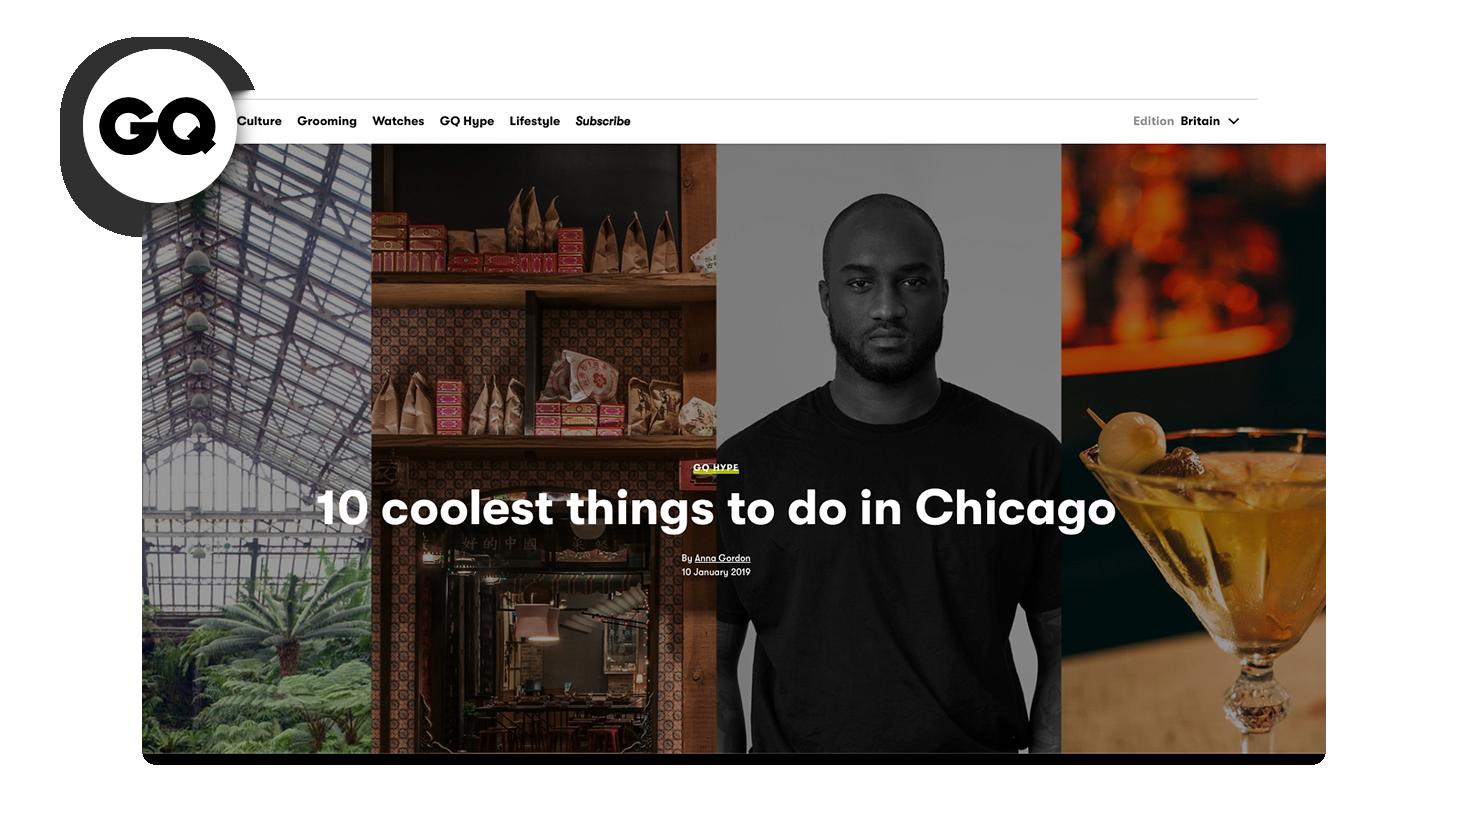 ThumbnailsGQ-Chicago.png